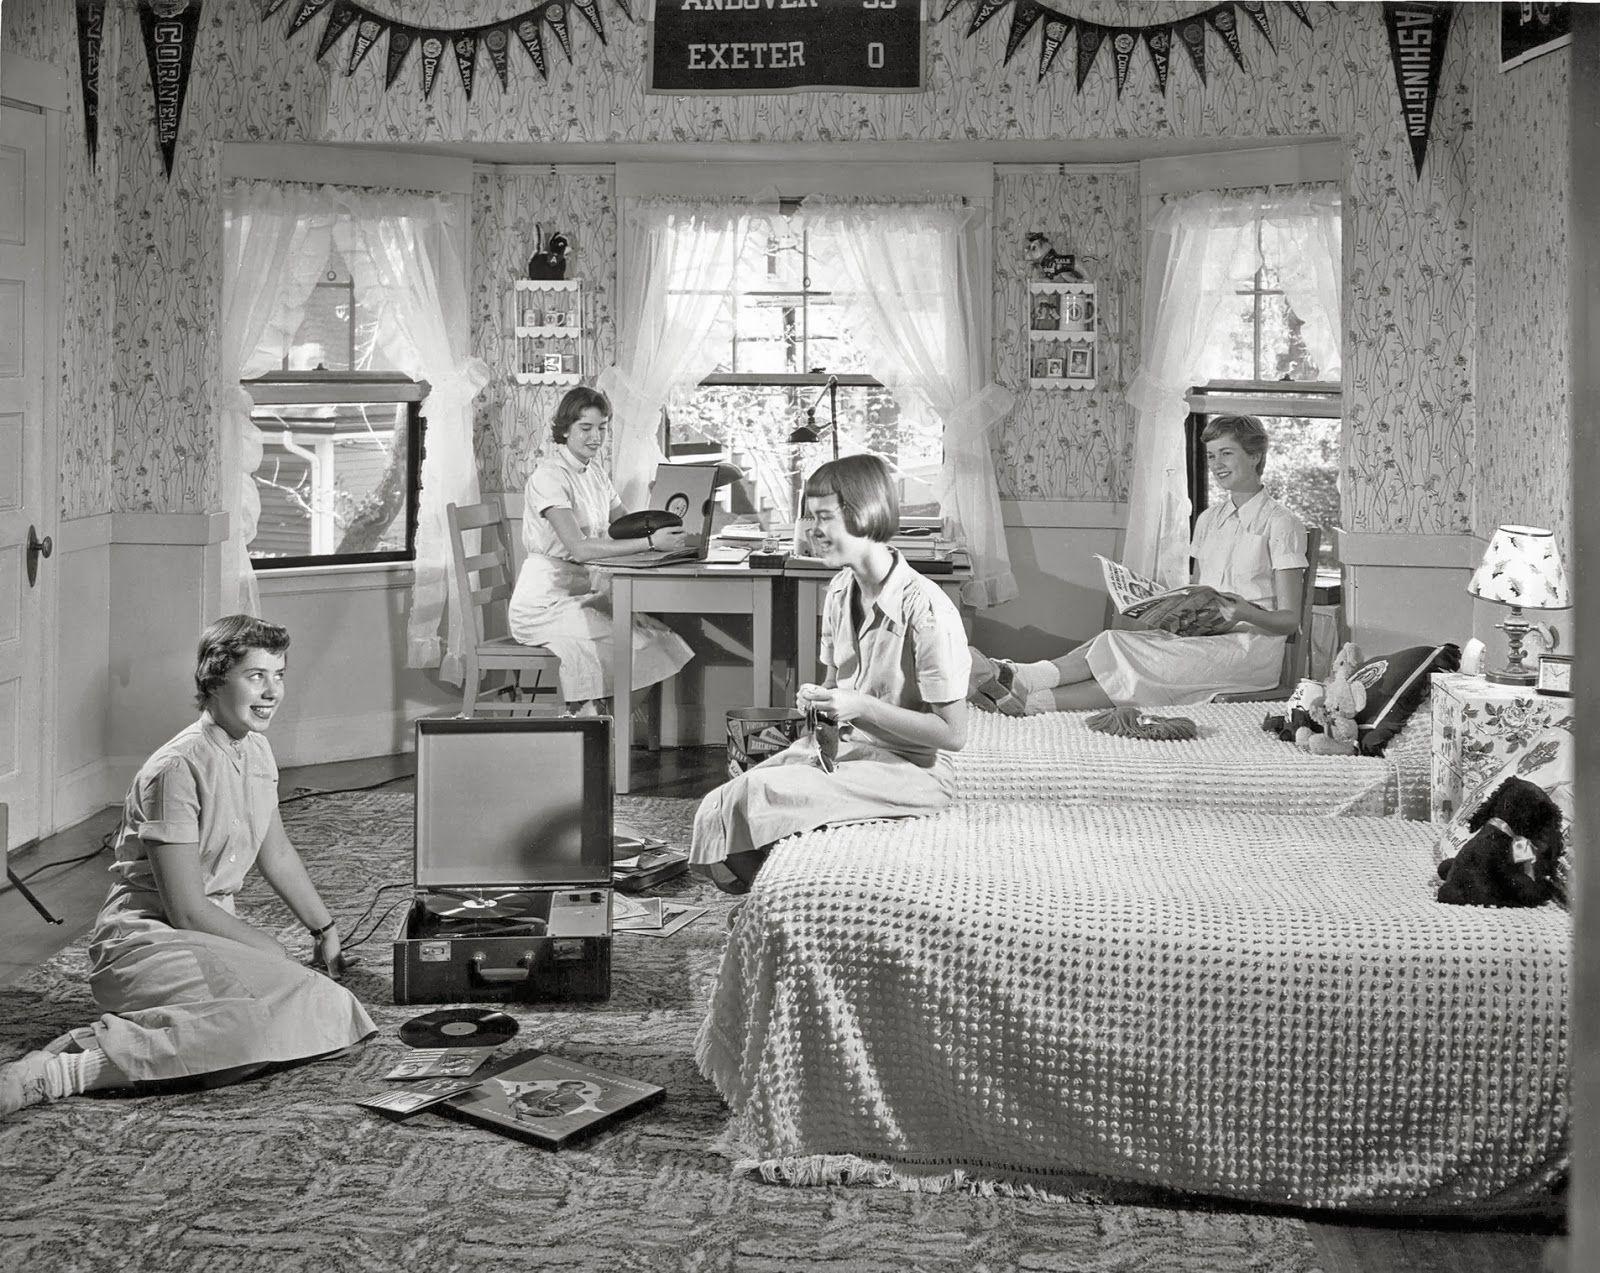 William+Rittase+-+Girls+listening+to+records+in+a+1958+dorm.jpg (1600×1273)